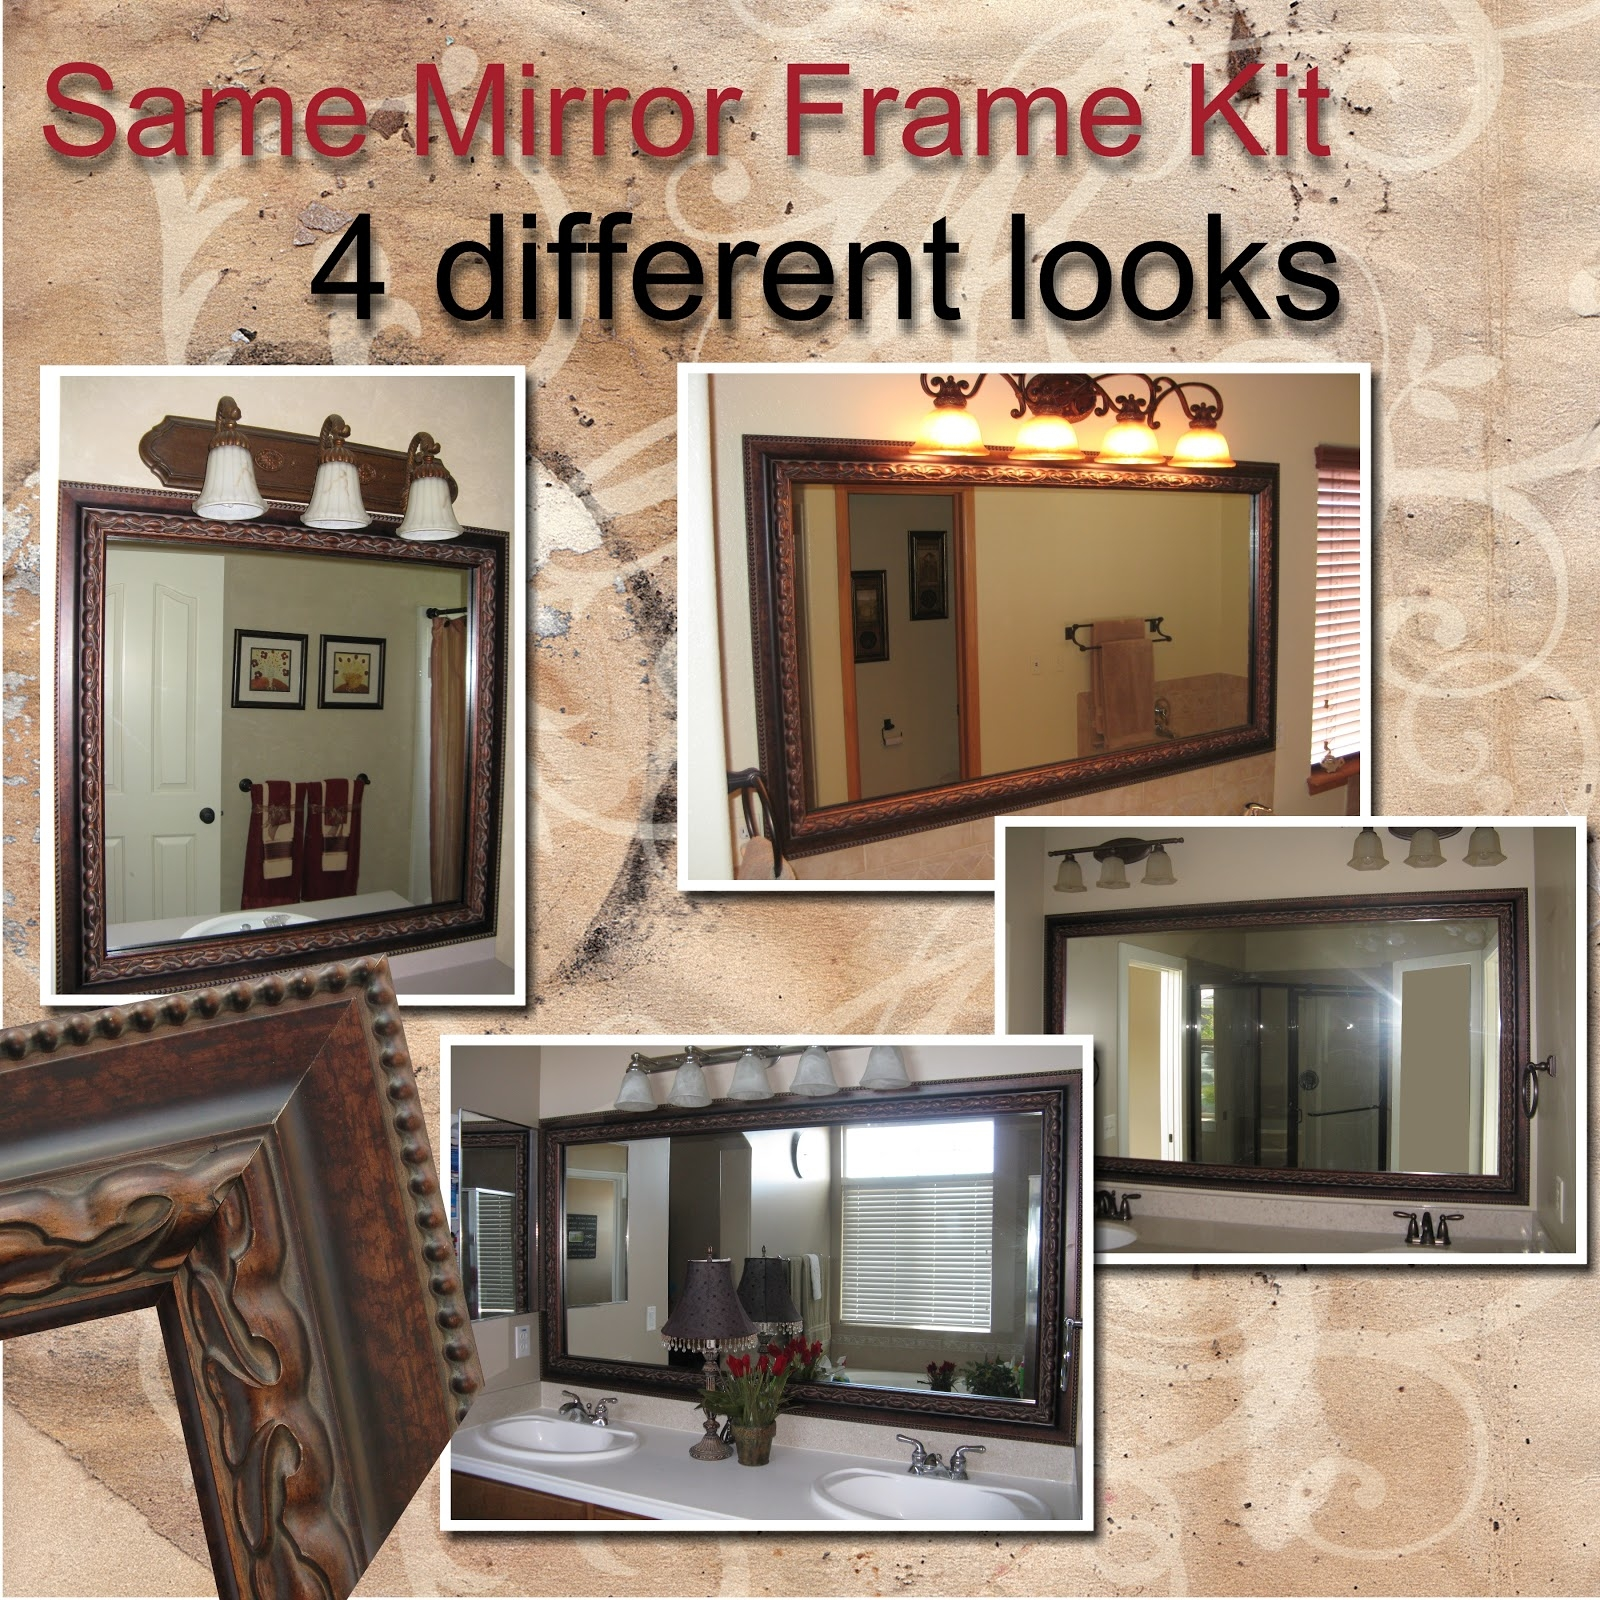 Permalink to Bathroom Mirror Framing Kit